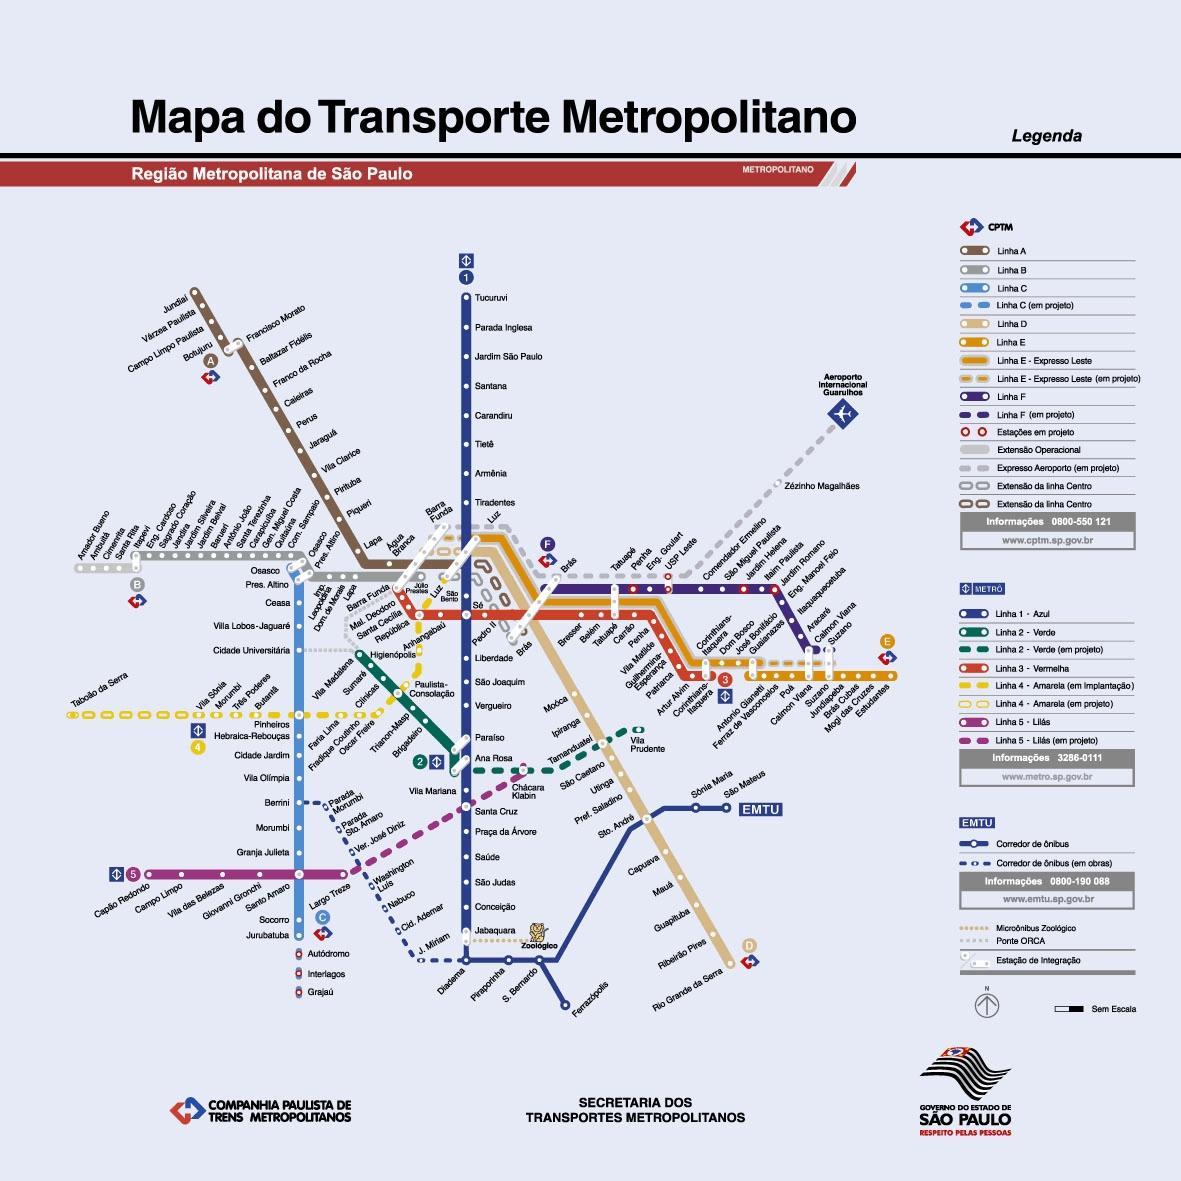 http://2.bp.blogspot.com/-fO4NpeRJUDg/TfZtpxqMBcI/AAAAAAAAAVo/X9GBXindH3U/s1600/mapa.jpg